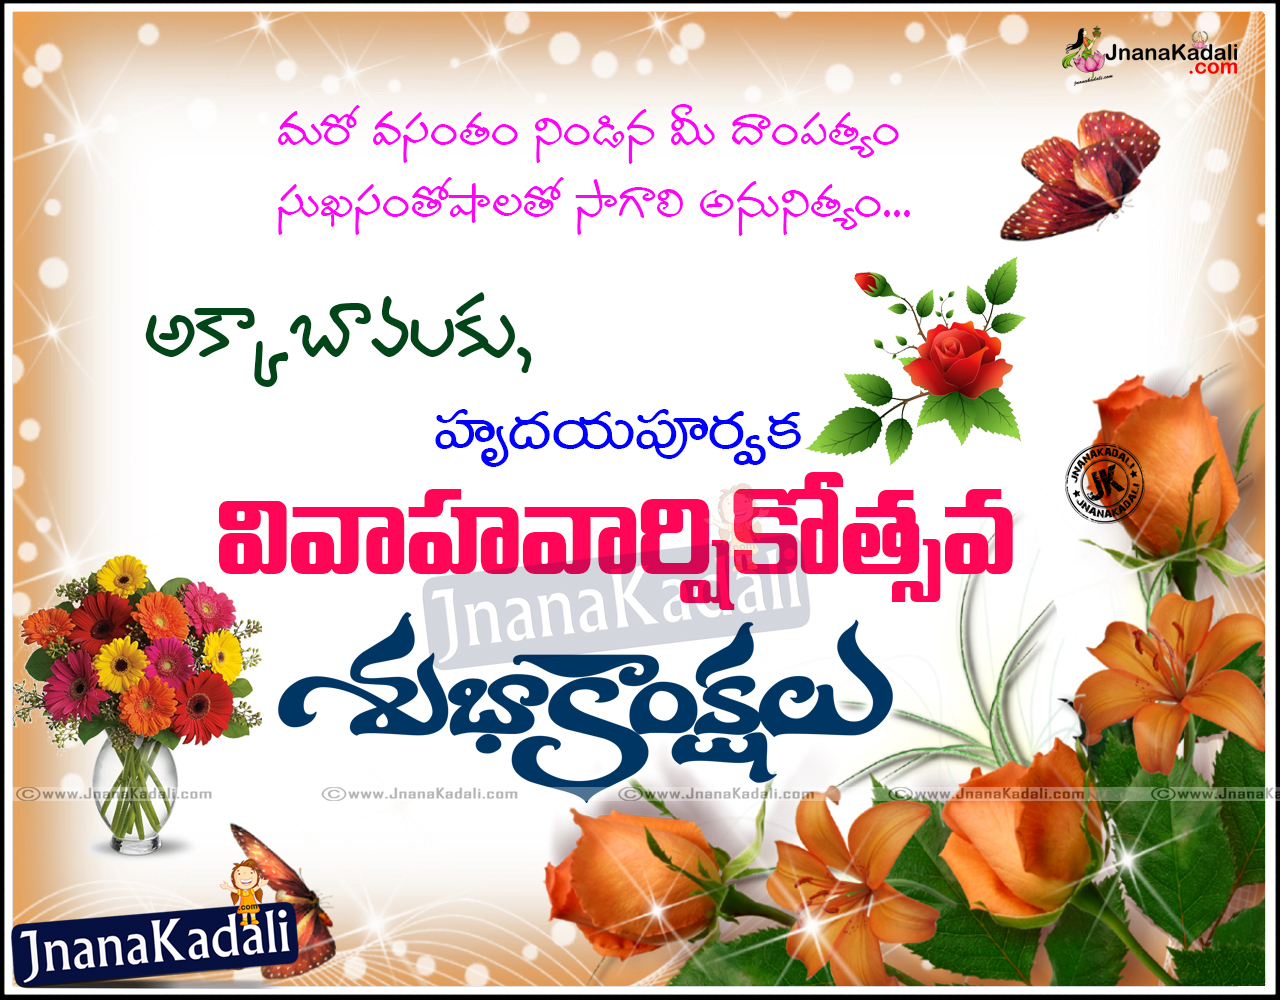 Marriage Day Hd Telugu Kavithalu Wallpapers For Sister Jnana Kadali Com Telugu Quotes English Quotes Hindi Quotes Tamil Quotes Dharmasandehalu